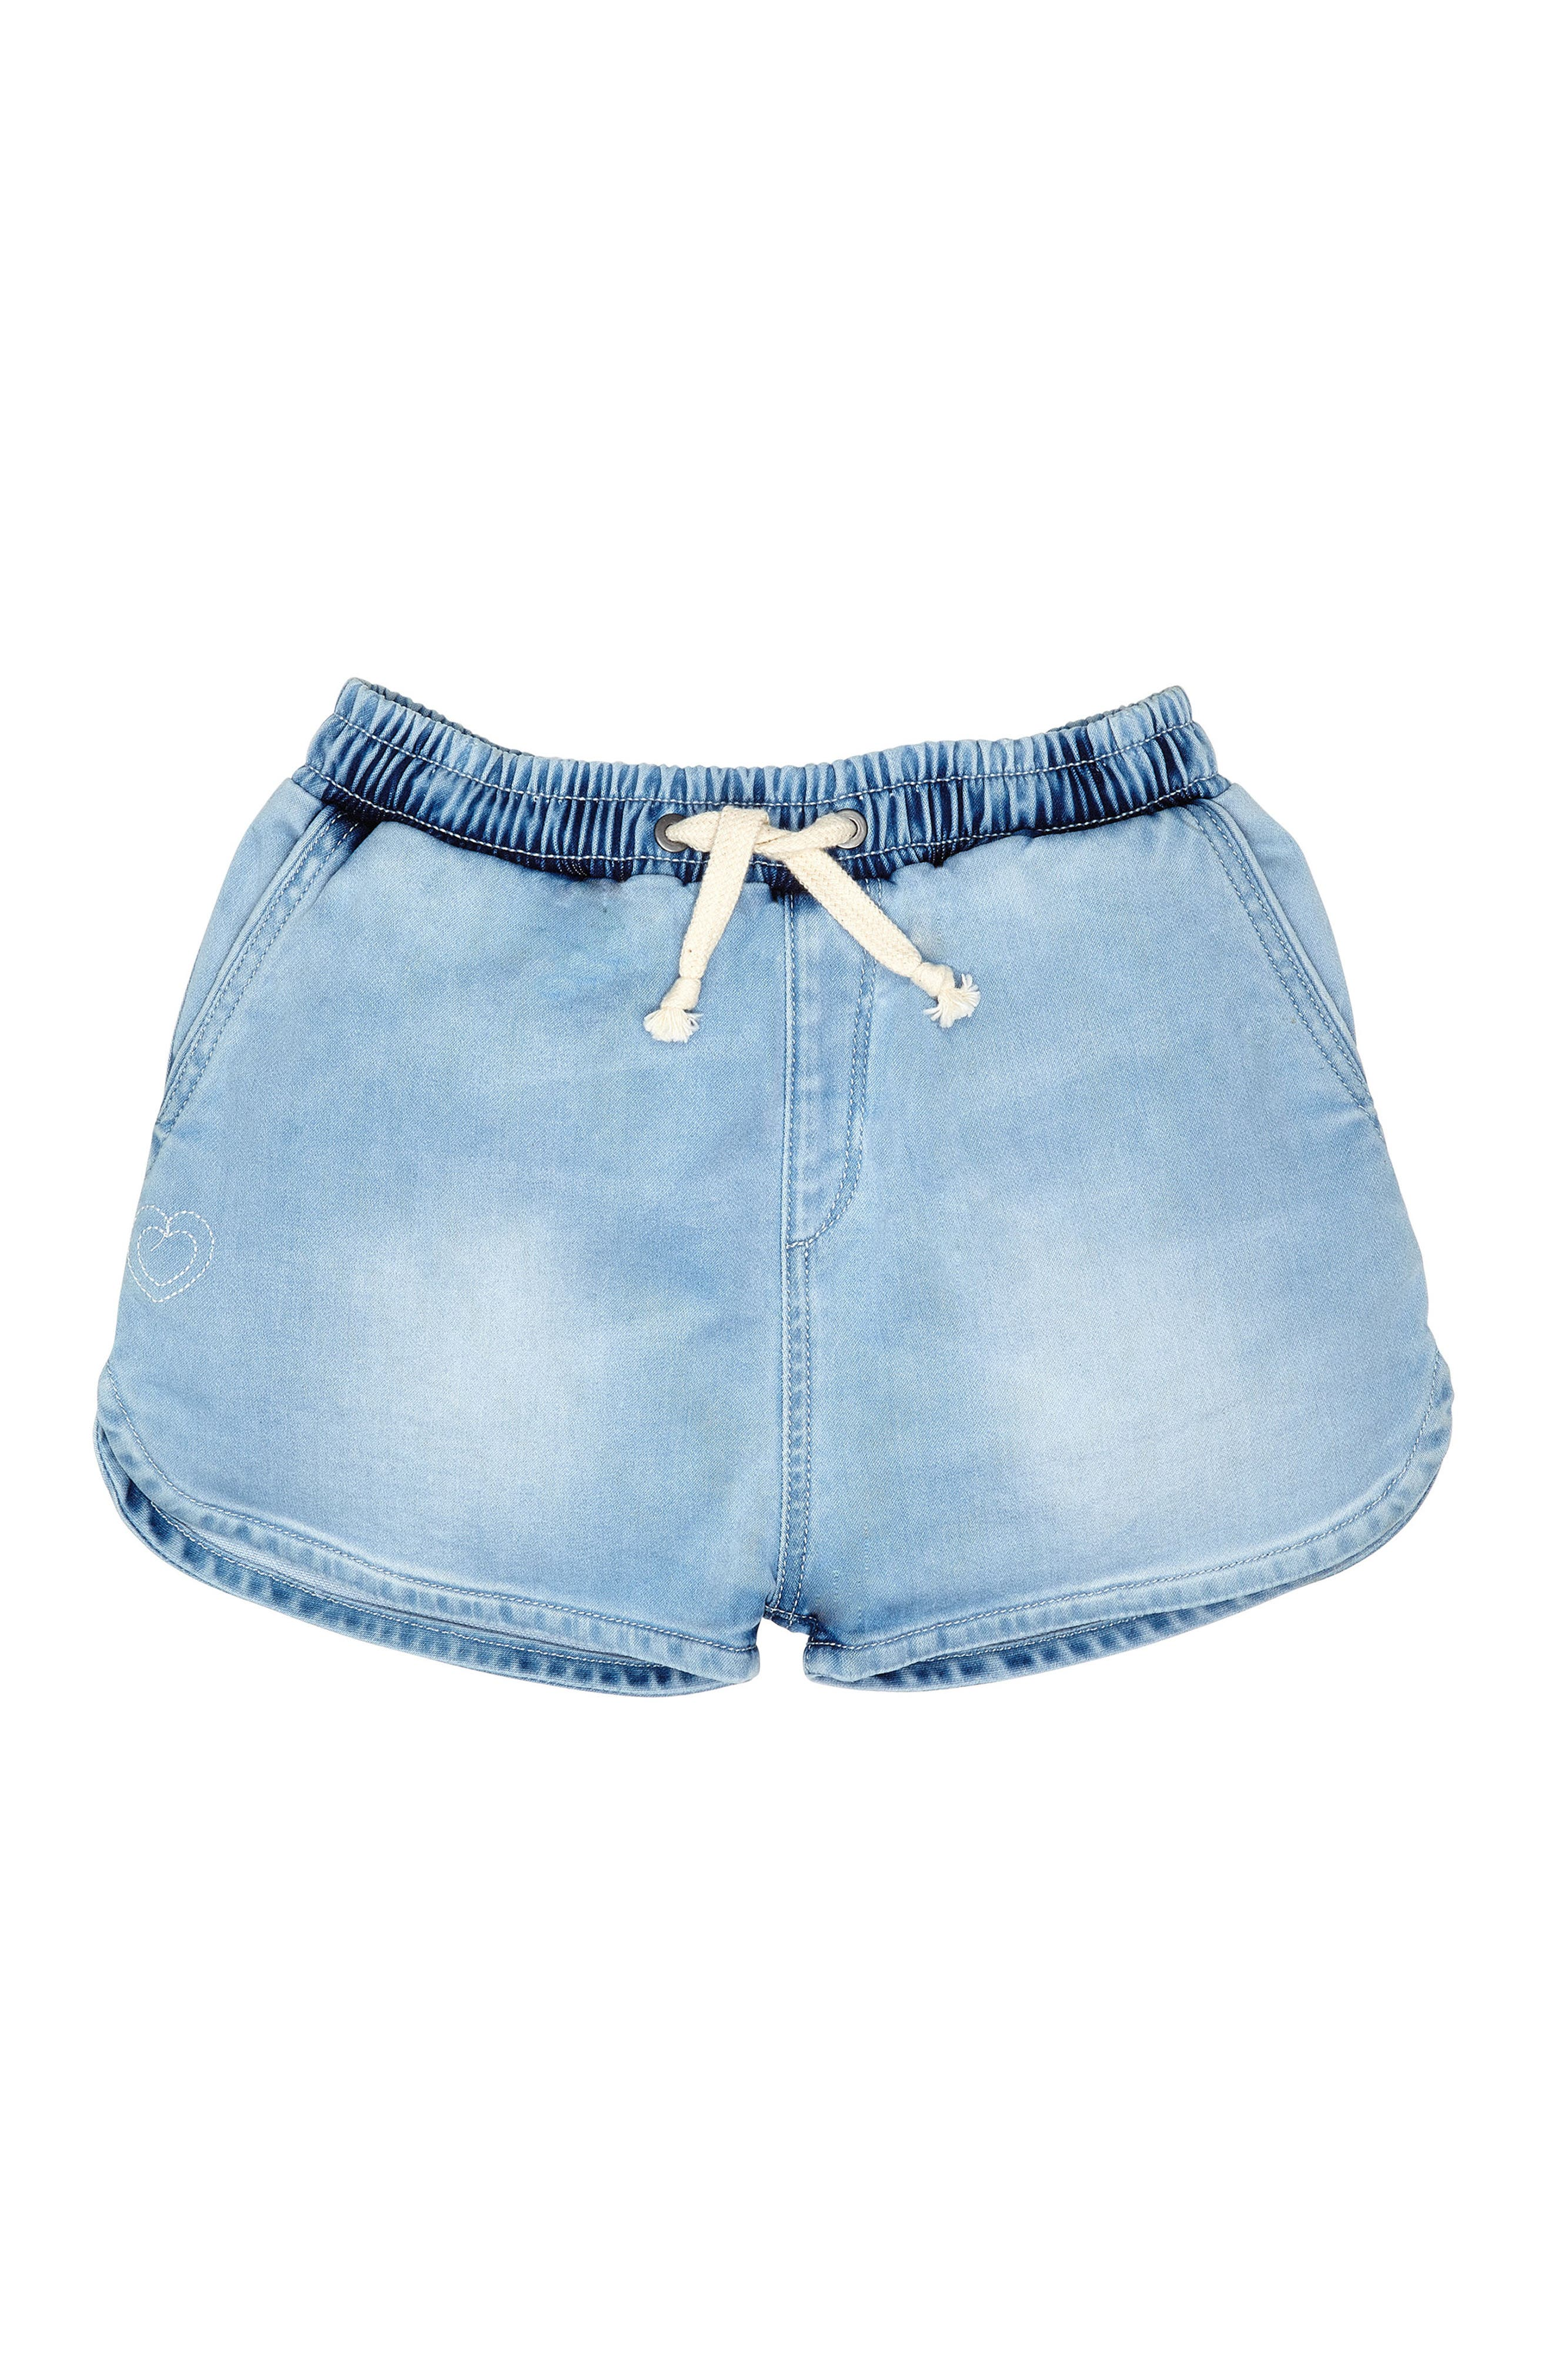 Denim Sport Shorts,                         Main,                         color,